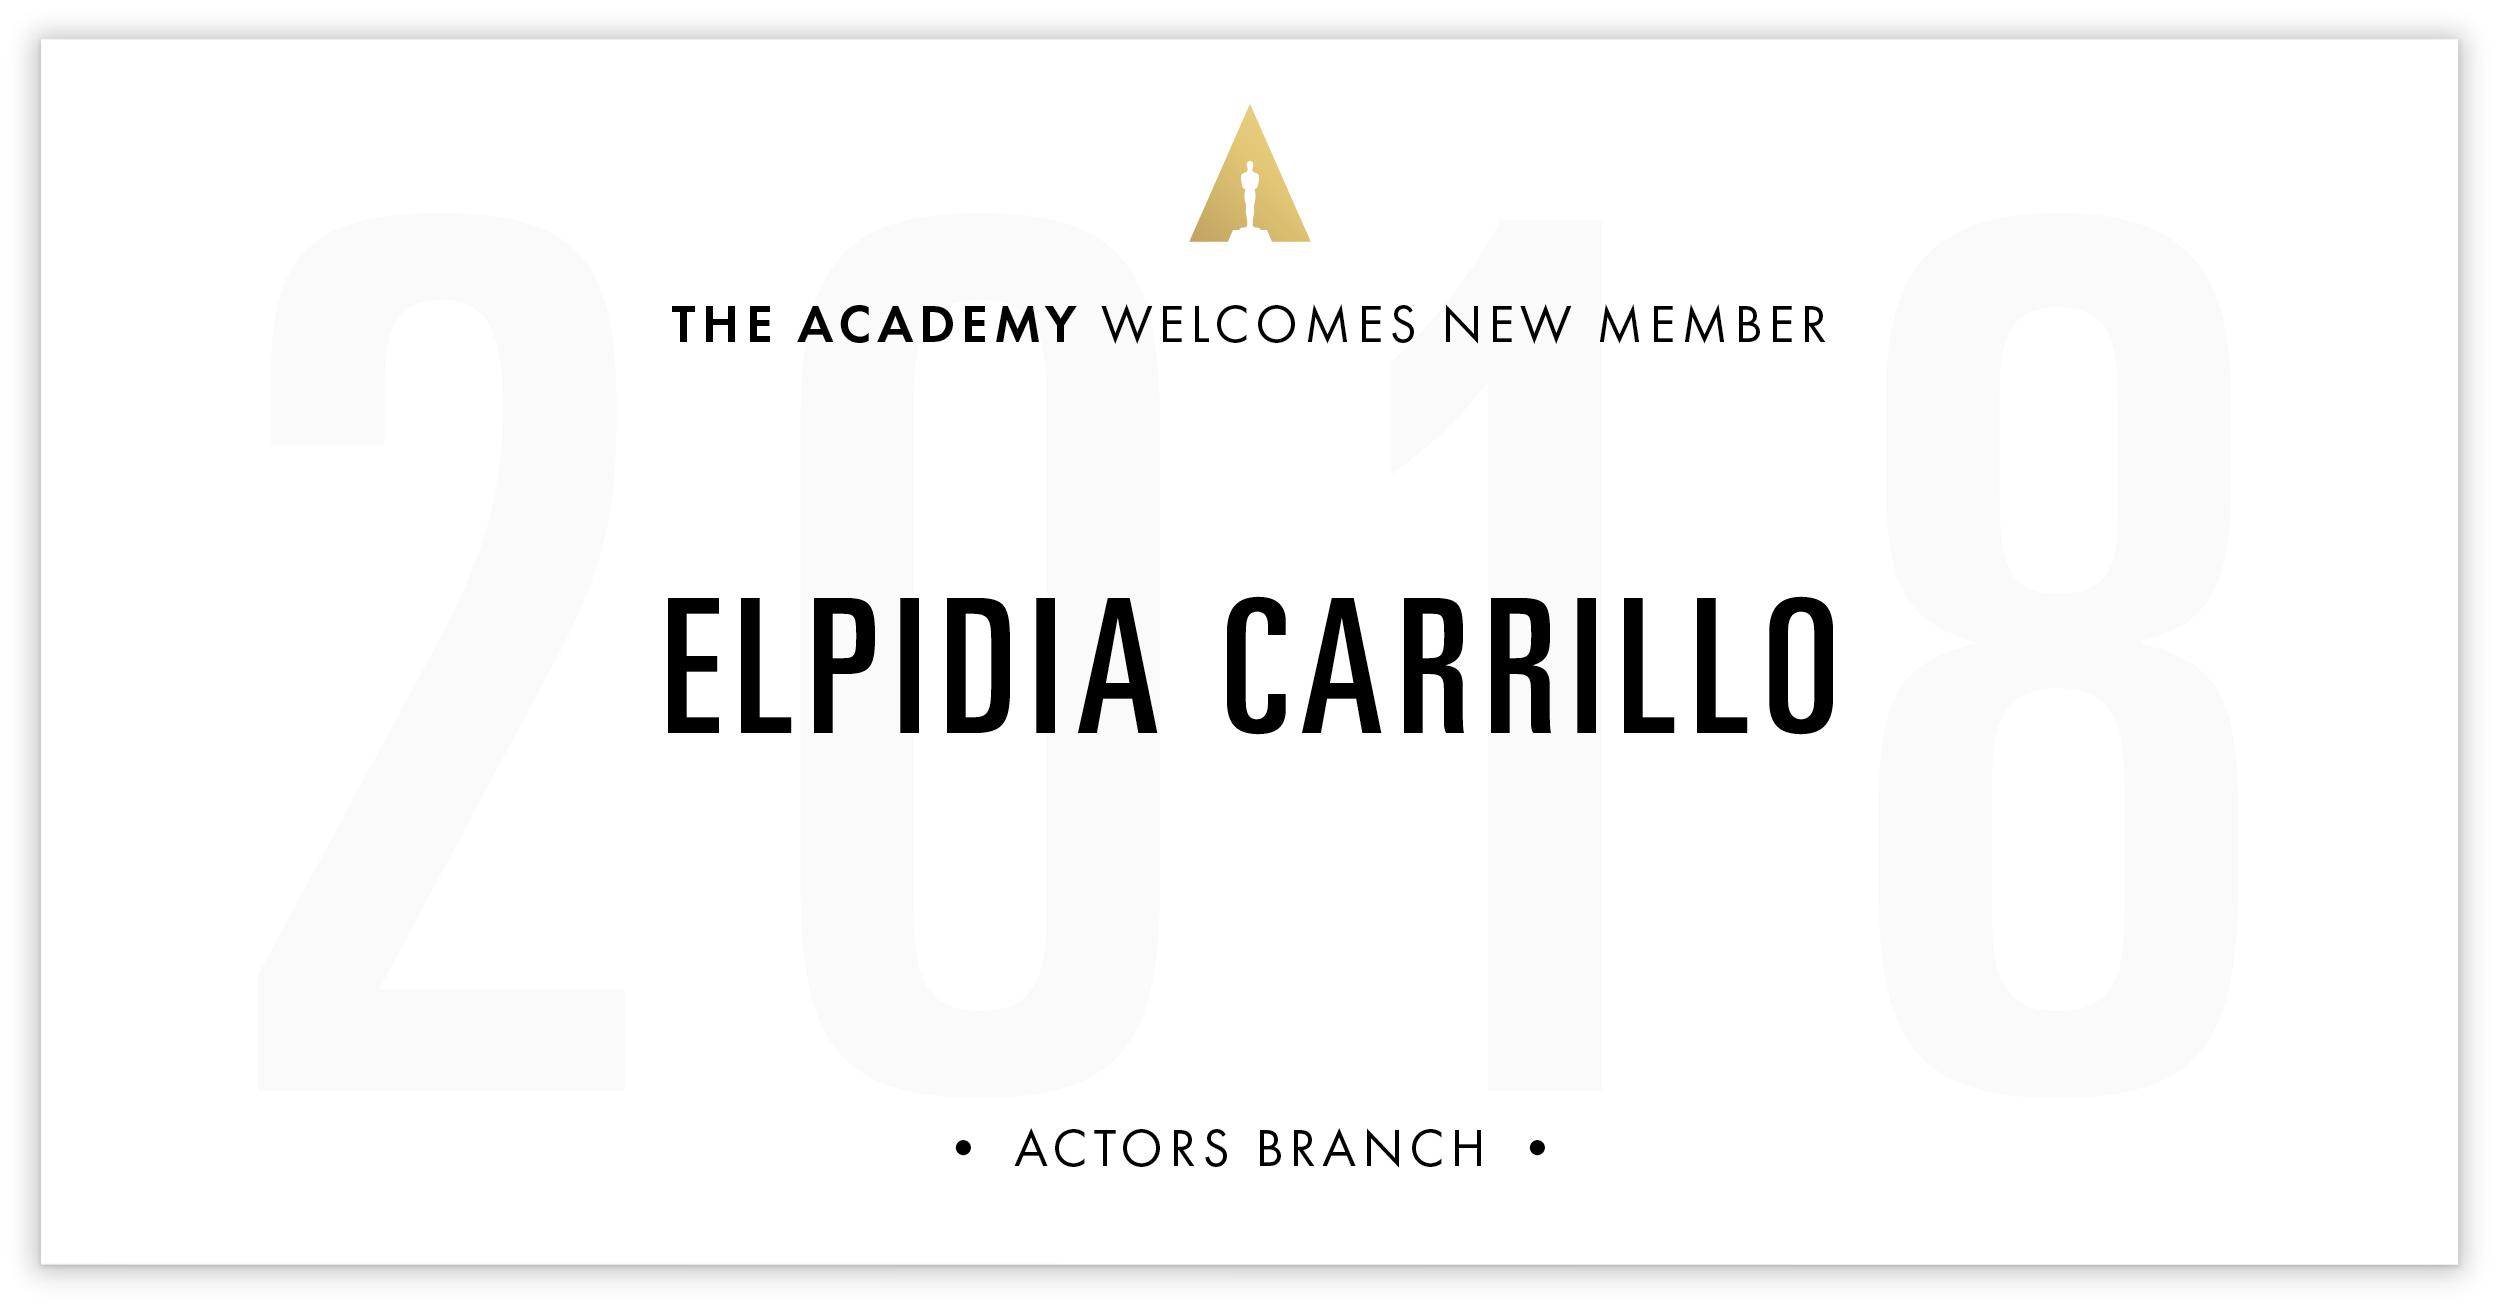 Elpidia Carrillo is invited!